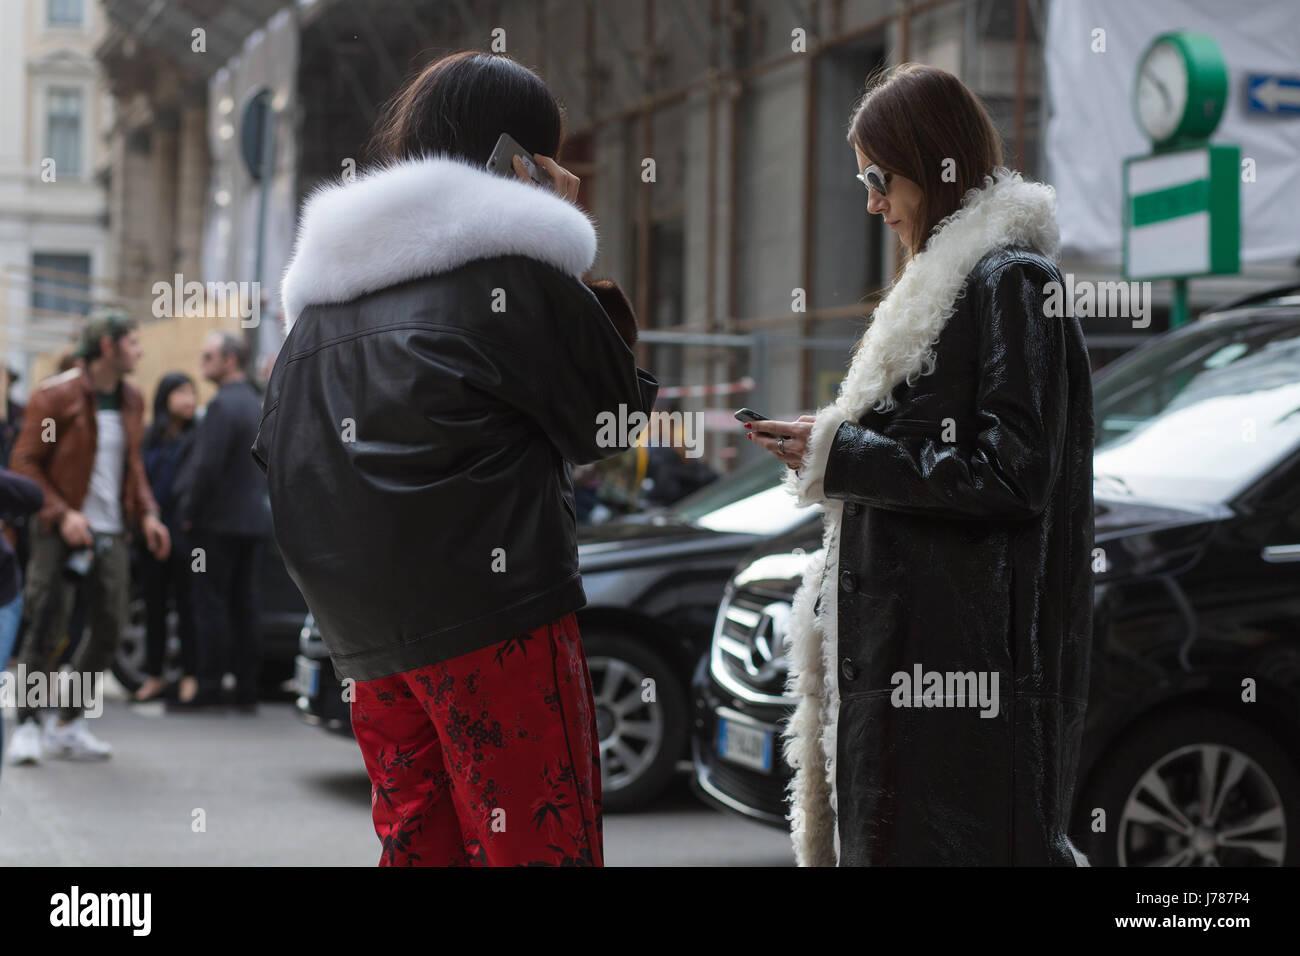 Gilda Abrosio and Giulia Tordini after Ferragamo show during the Milan Fashion Week Fall/Winter 2017 - Stock Image